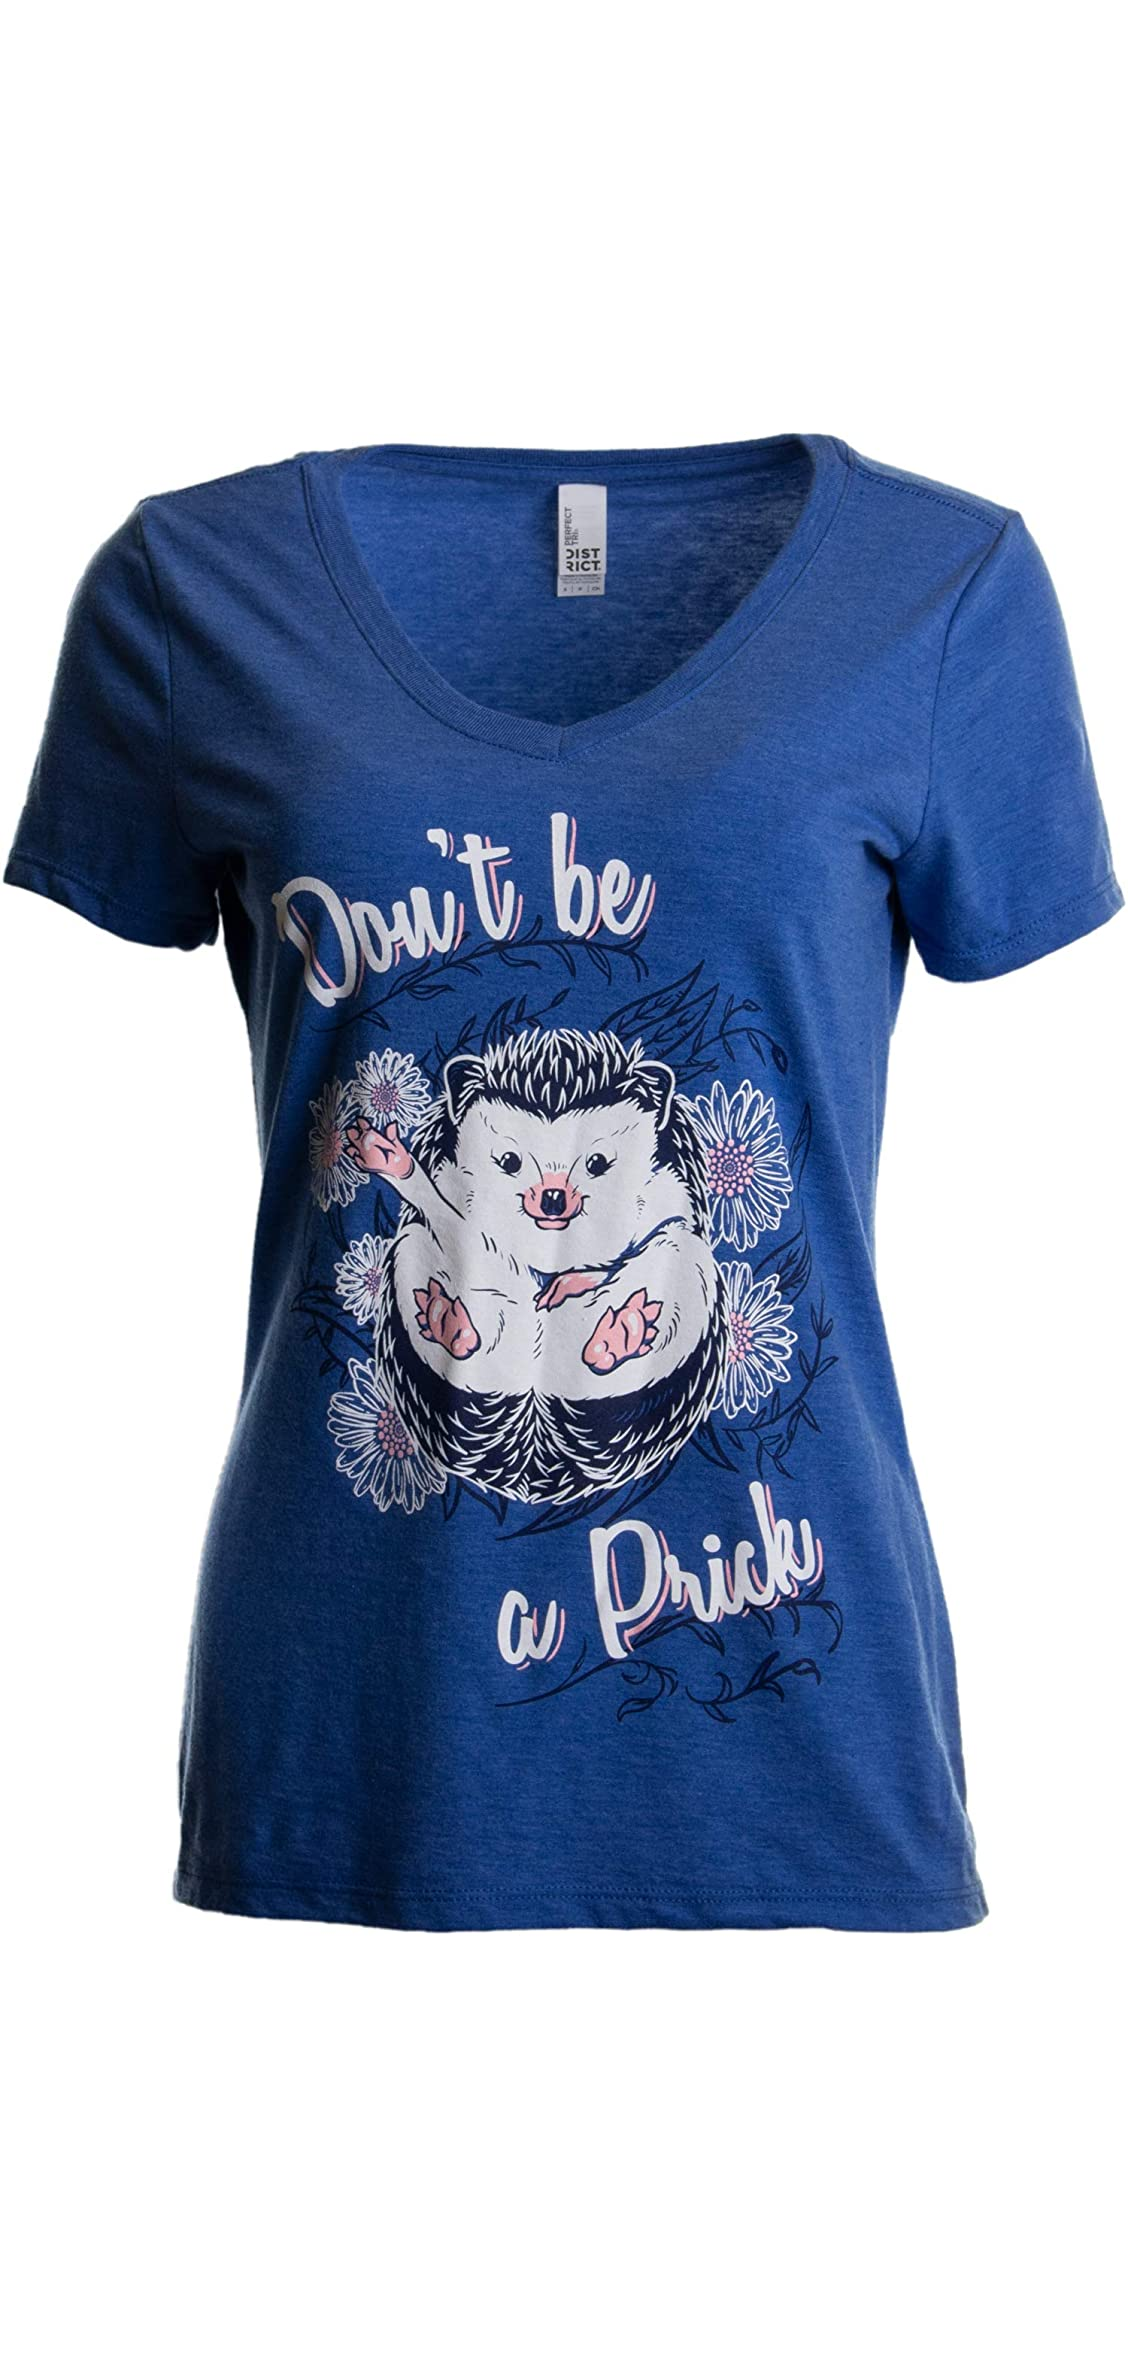 Don't Be A Prick  Funny Hedgehog Attitude Humor Saying V-neck